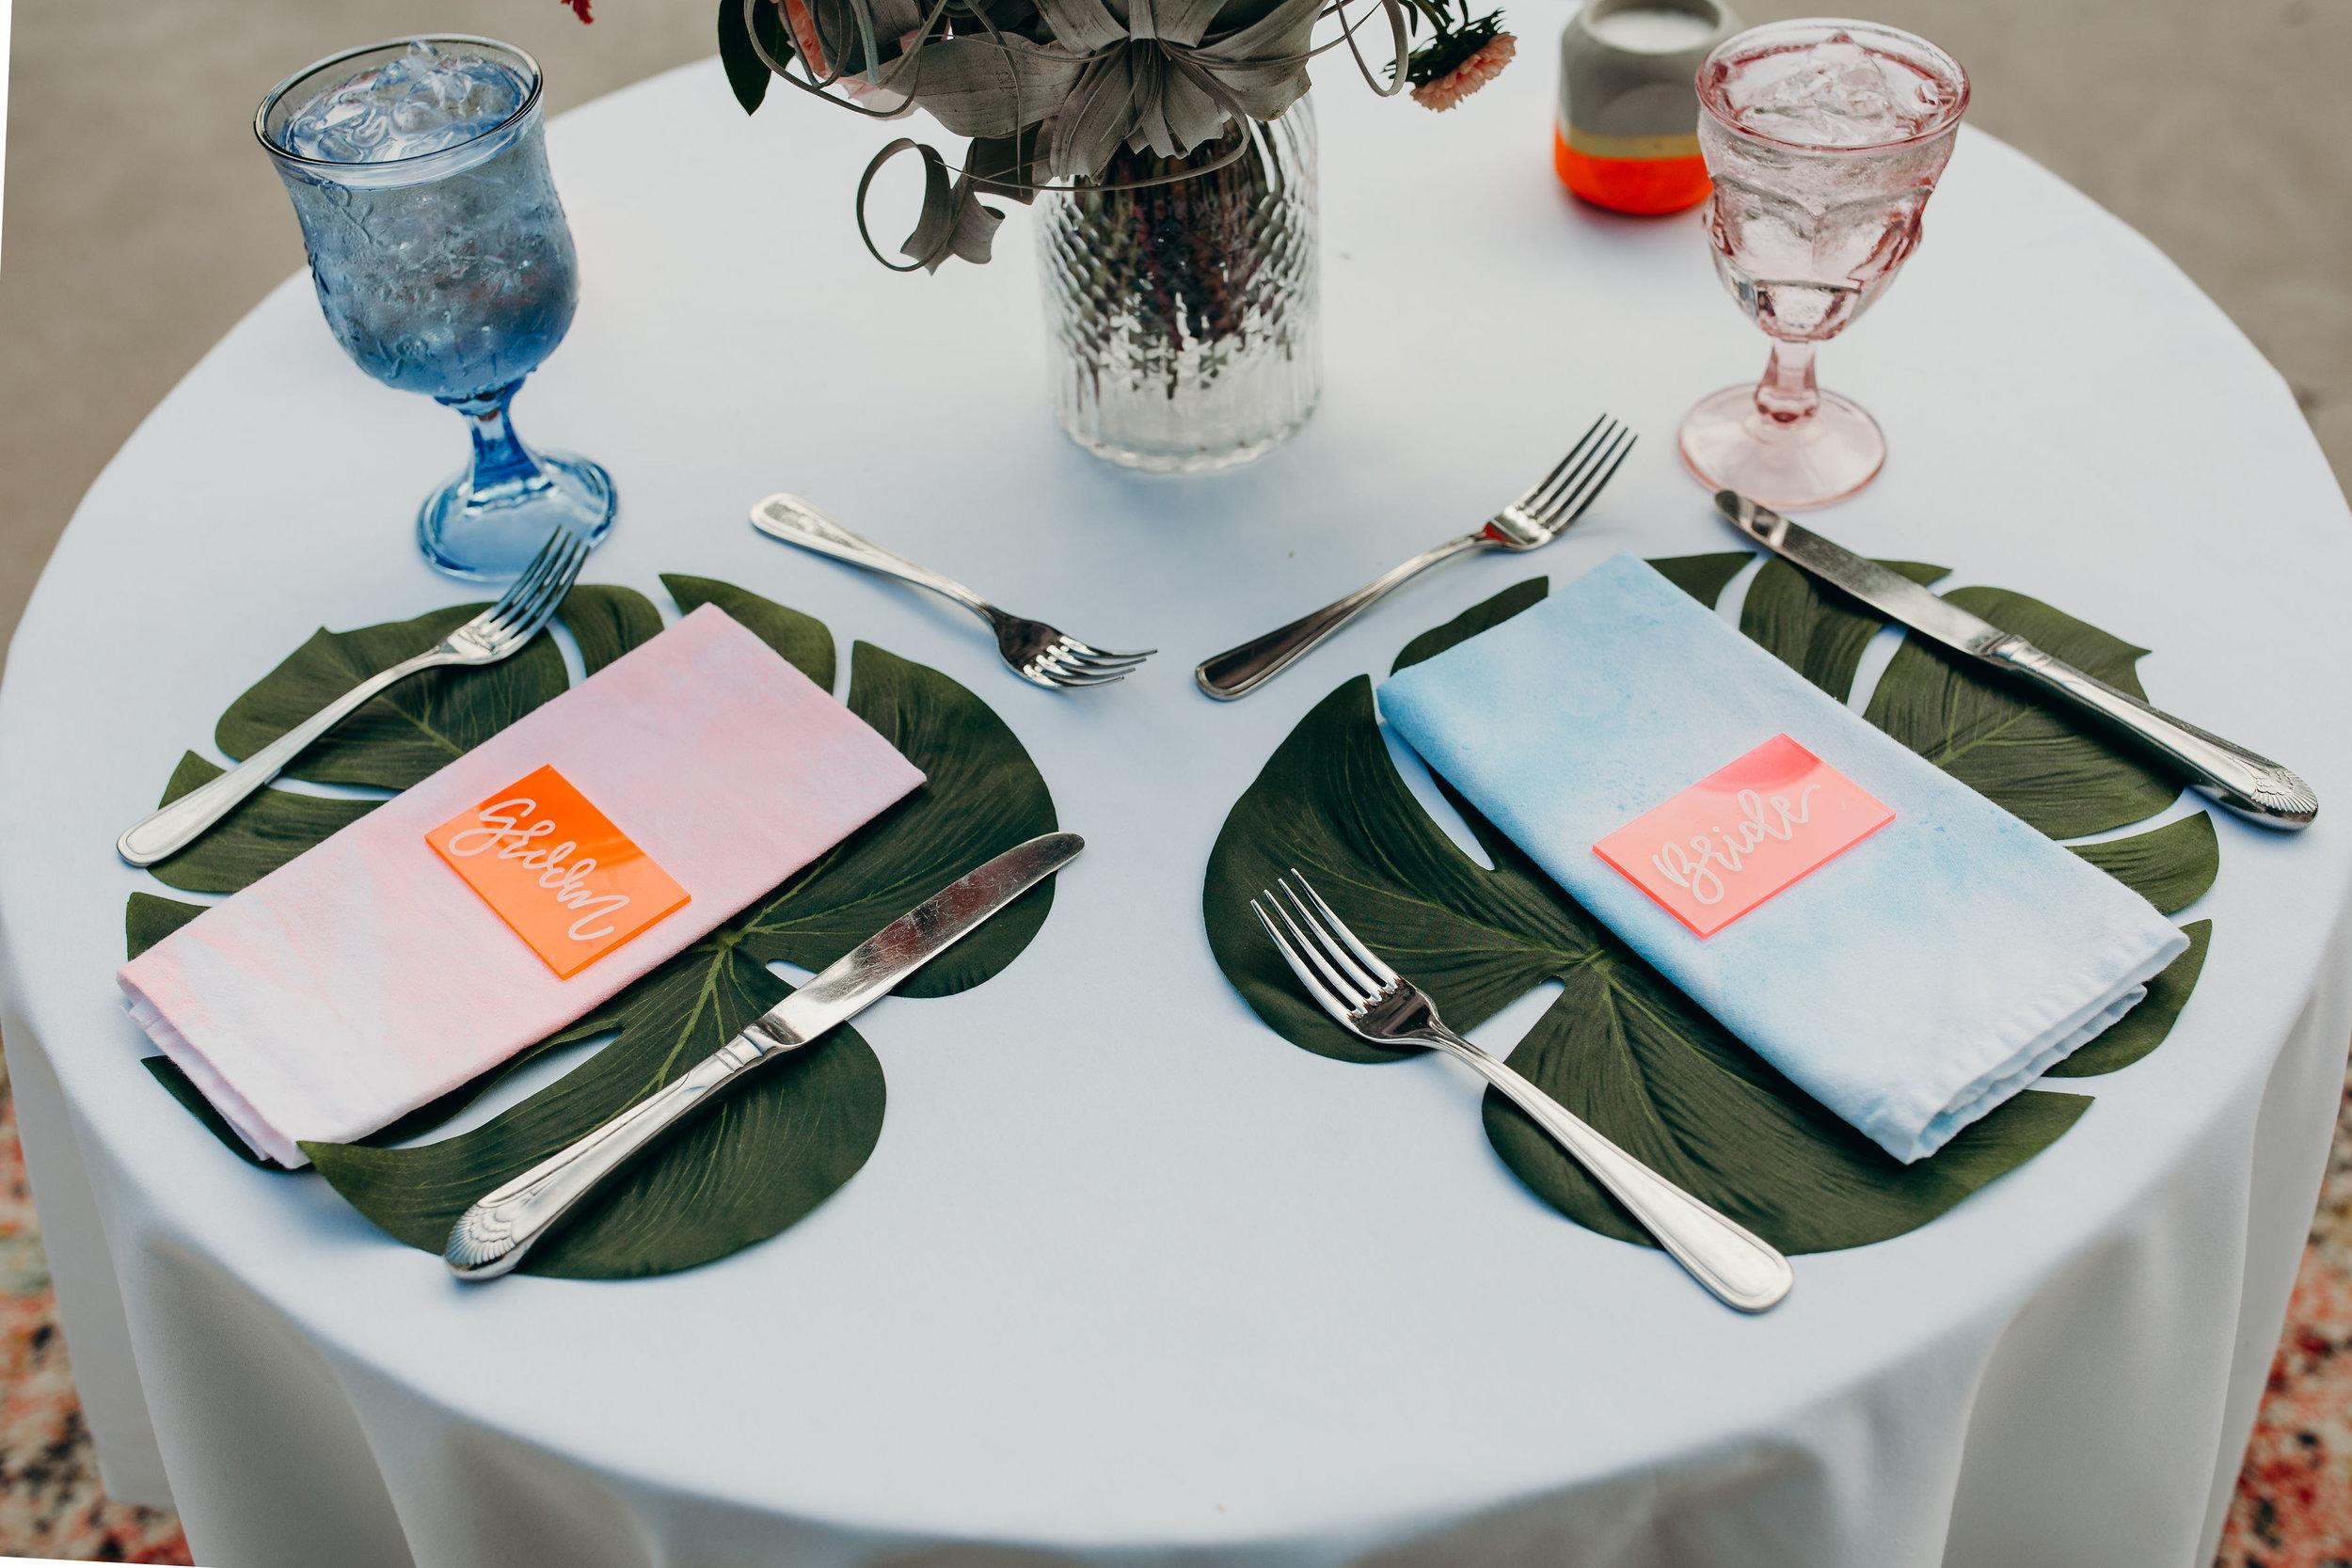 love-fern-design-studio-custom-wedding-invitations-for-the-modern-couple-modern-calligraphy-in-seattle-washington-custom-wedding-stationery-neon-acrylic-eclectic-alice-wonderland-wedding-sweetheart-table